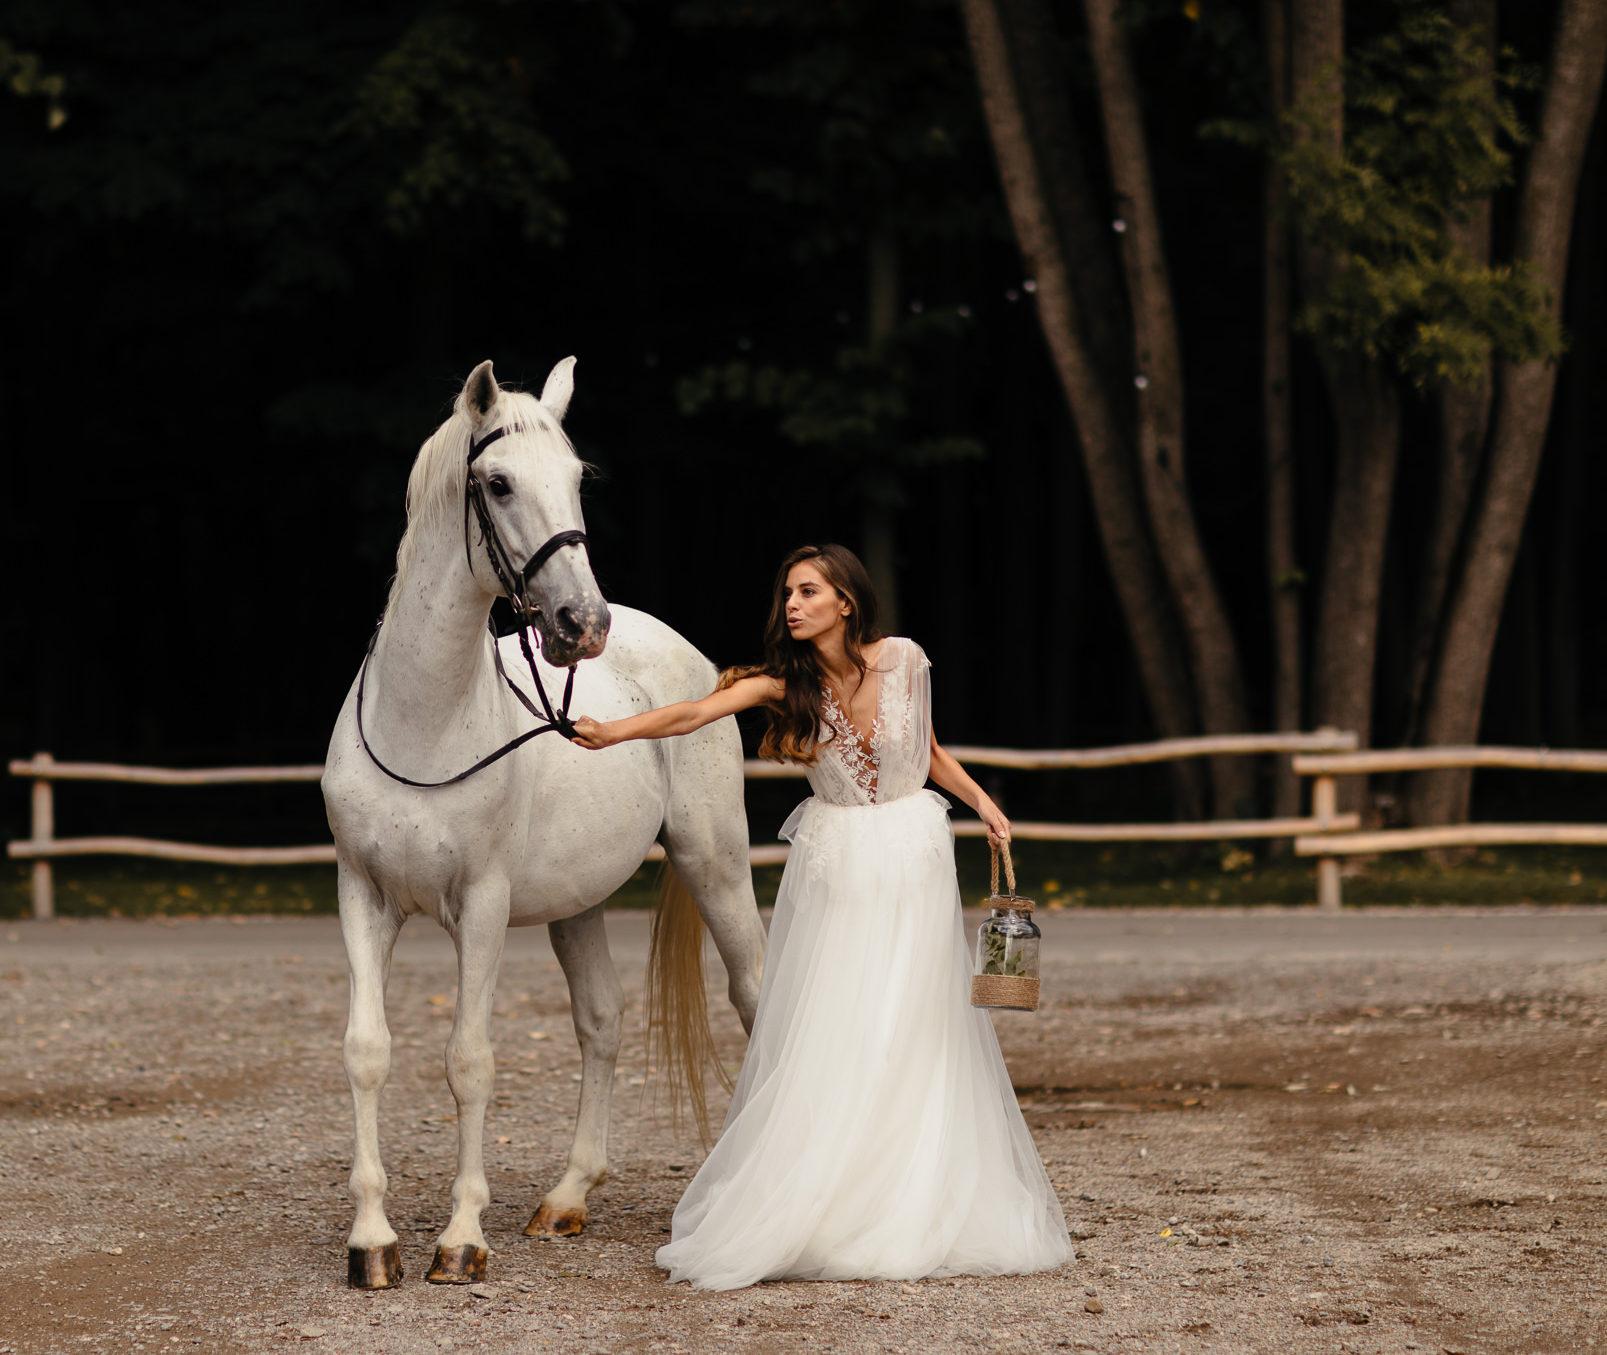 Oana Nutu Wedding Dress Rochie Mireasa Cal Alb Tul Sintetic Broderie Colectia 2019 (1)